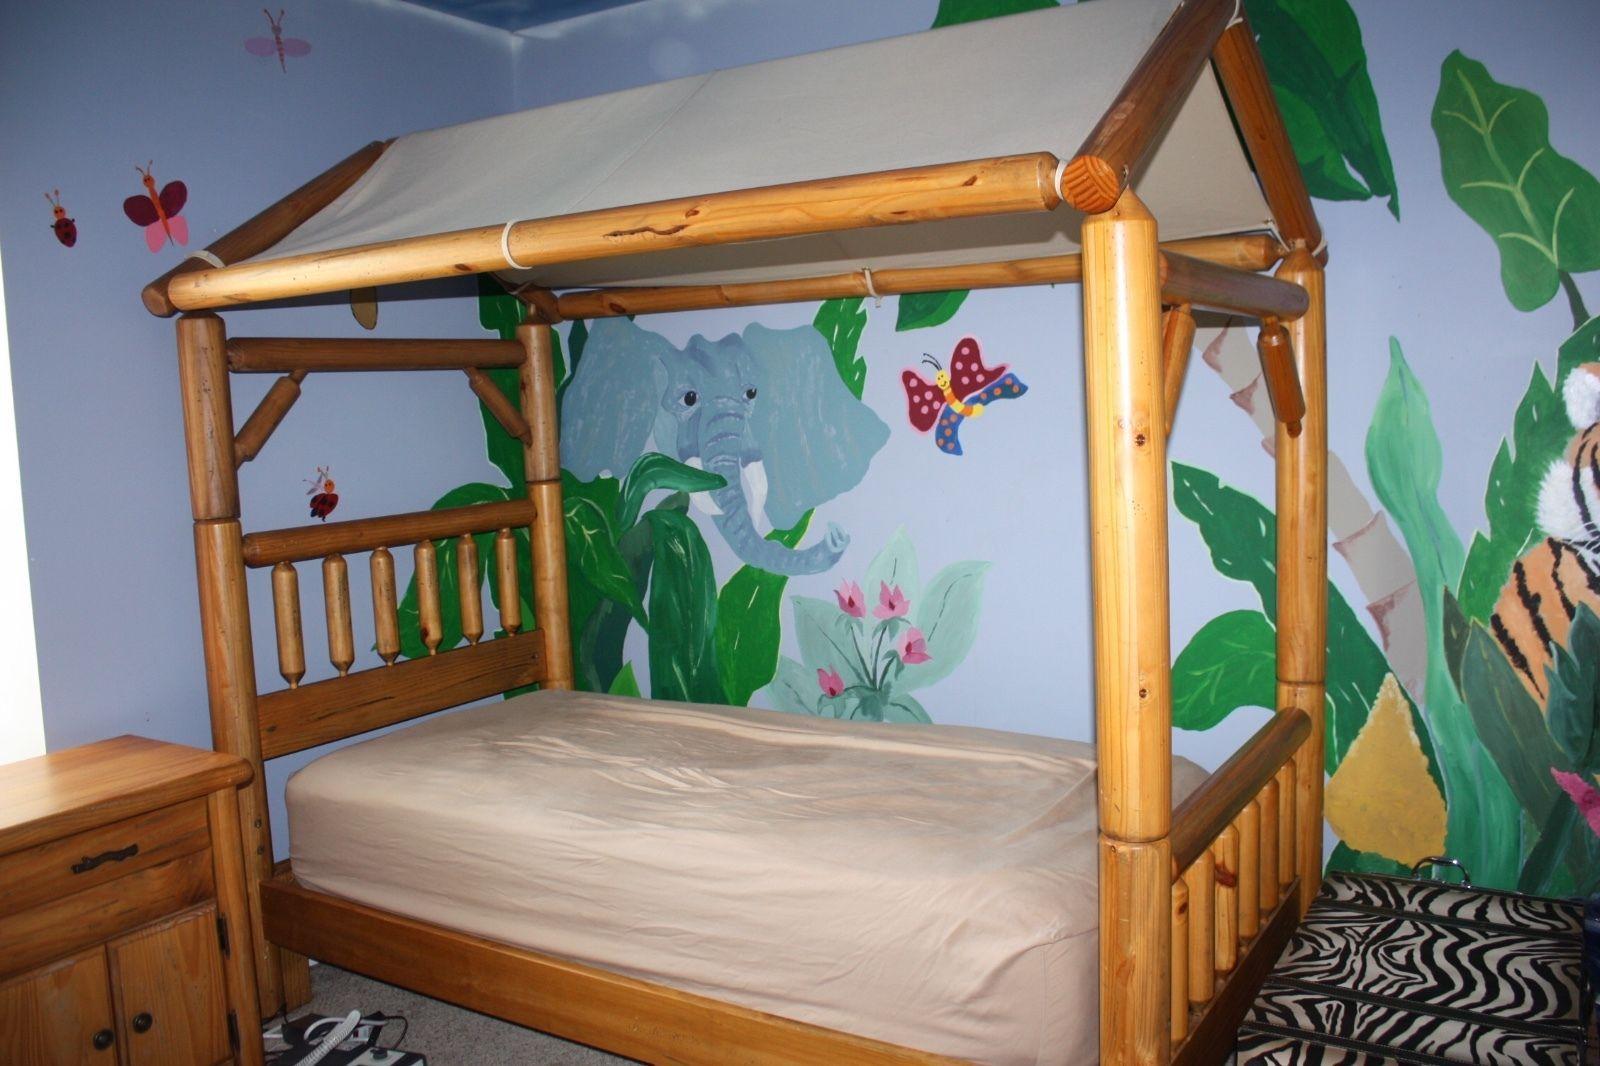 Kids Furniture American Signature Camp Granada Tent Bed, Desk/Chair,  Table,Chest